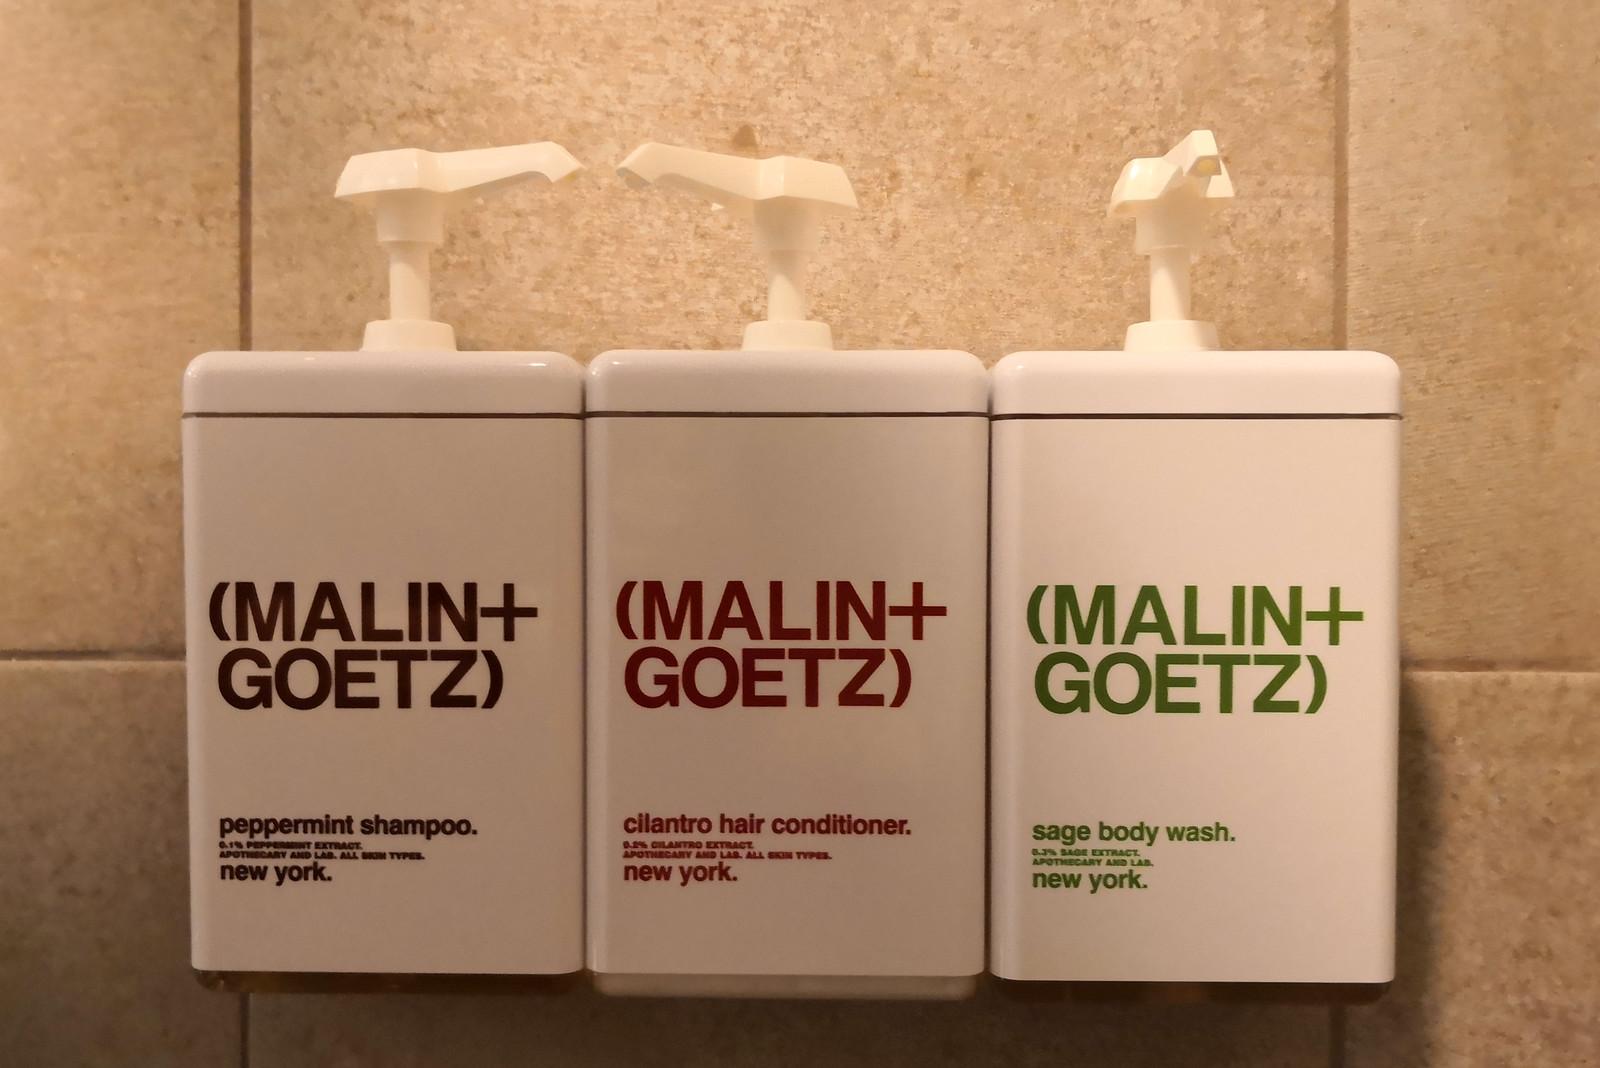 Malin + Goetz amenities